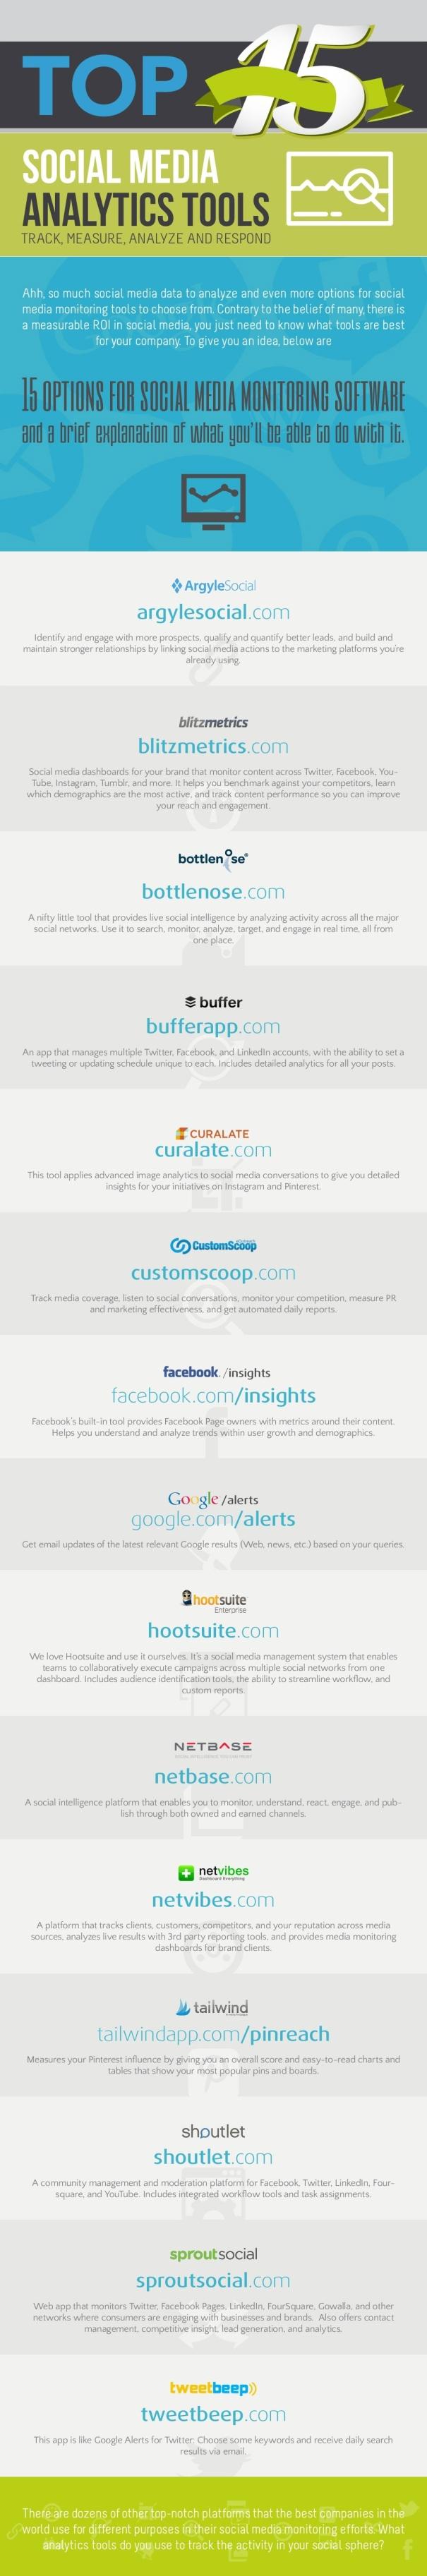 socialmedianalyticstools-GODIZITAL